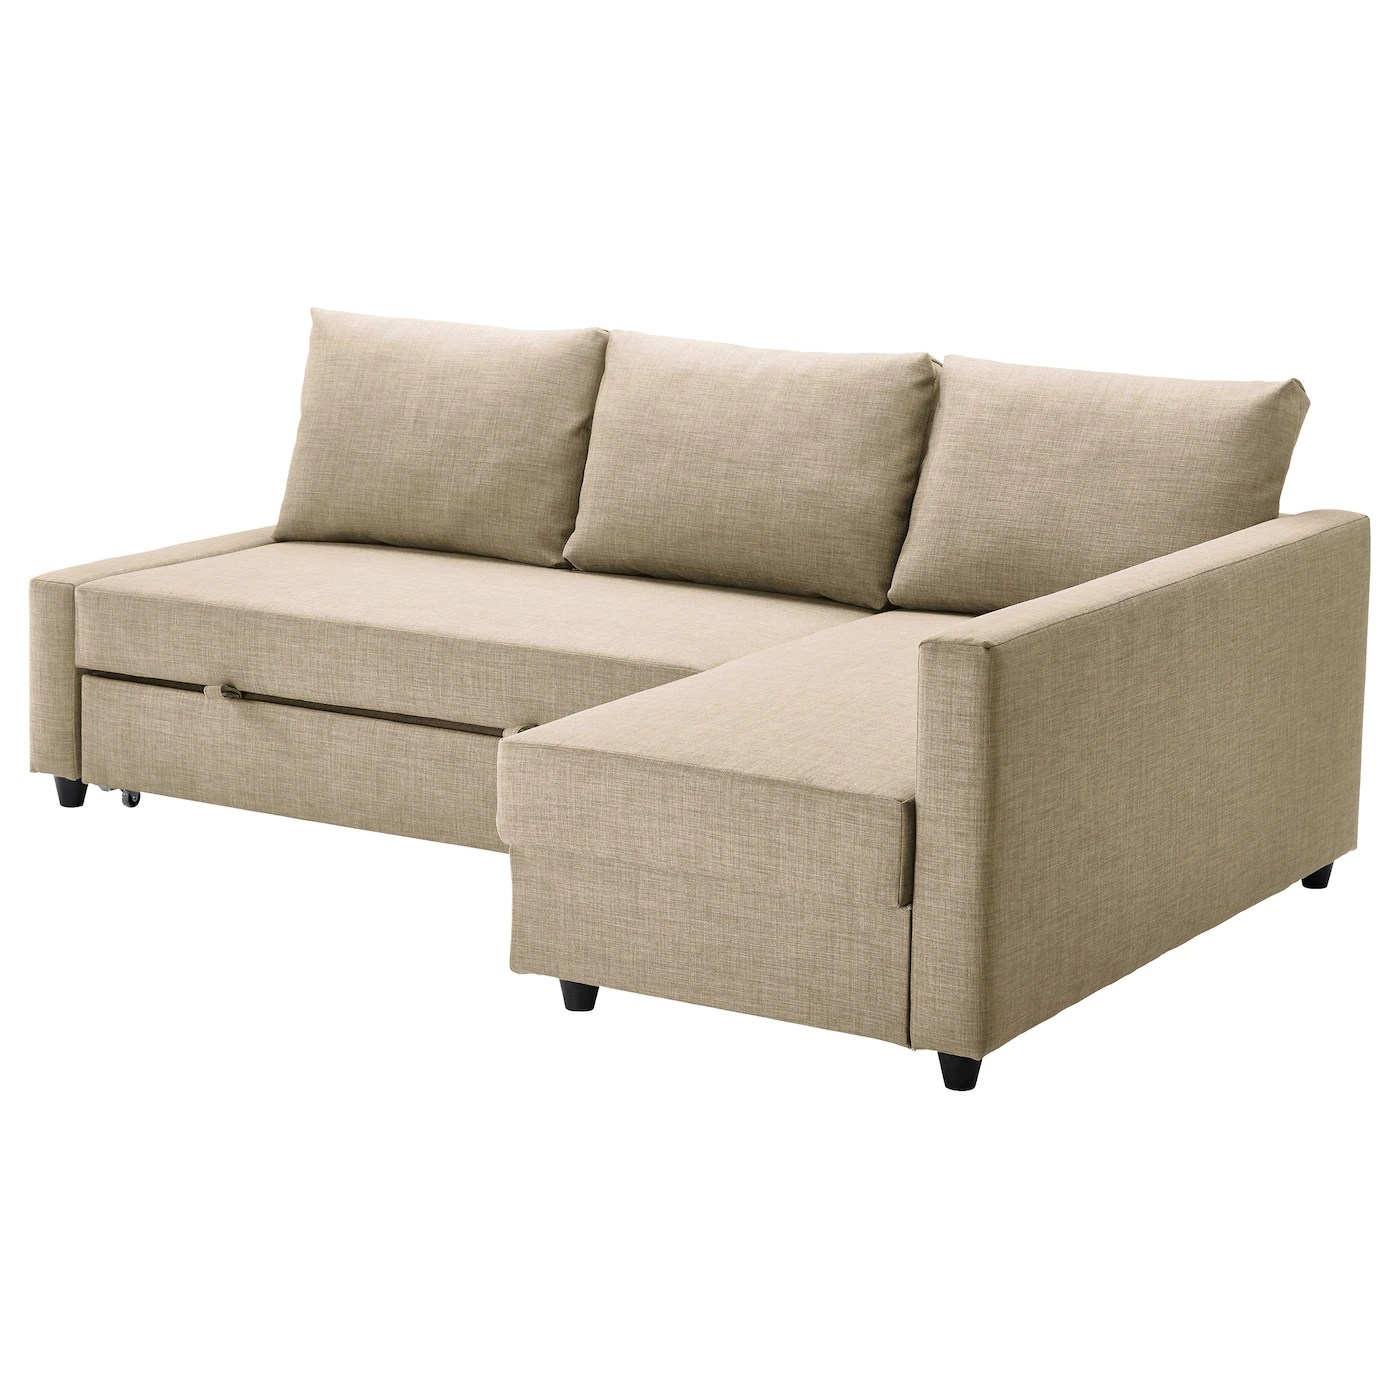 sofa chair bed ikea contemporary outdoor rocking friheten corner with storage skiftebo beige